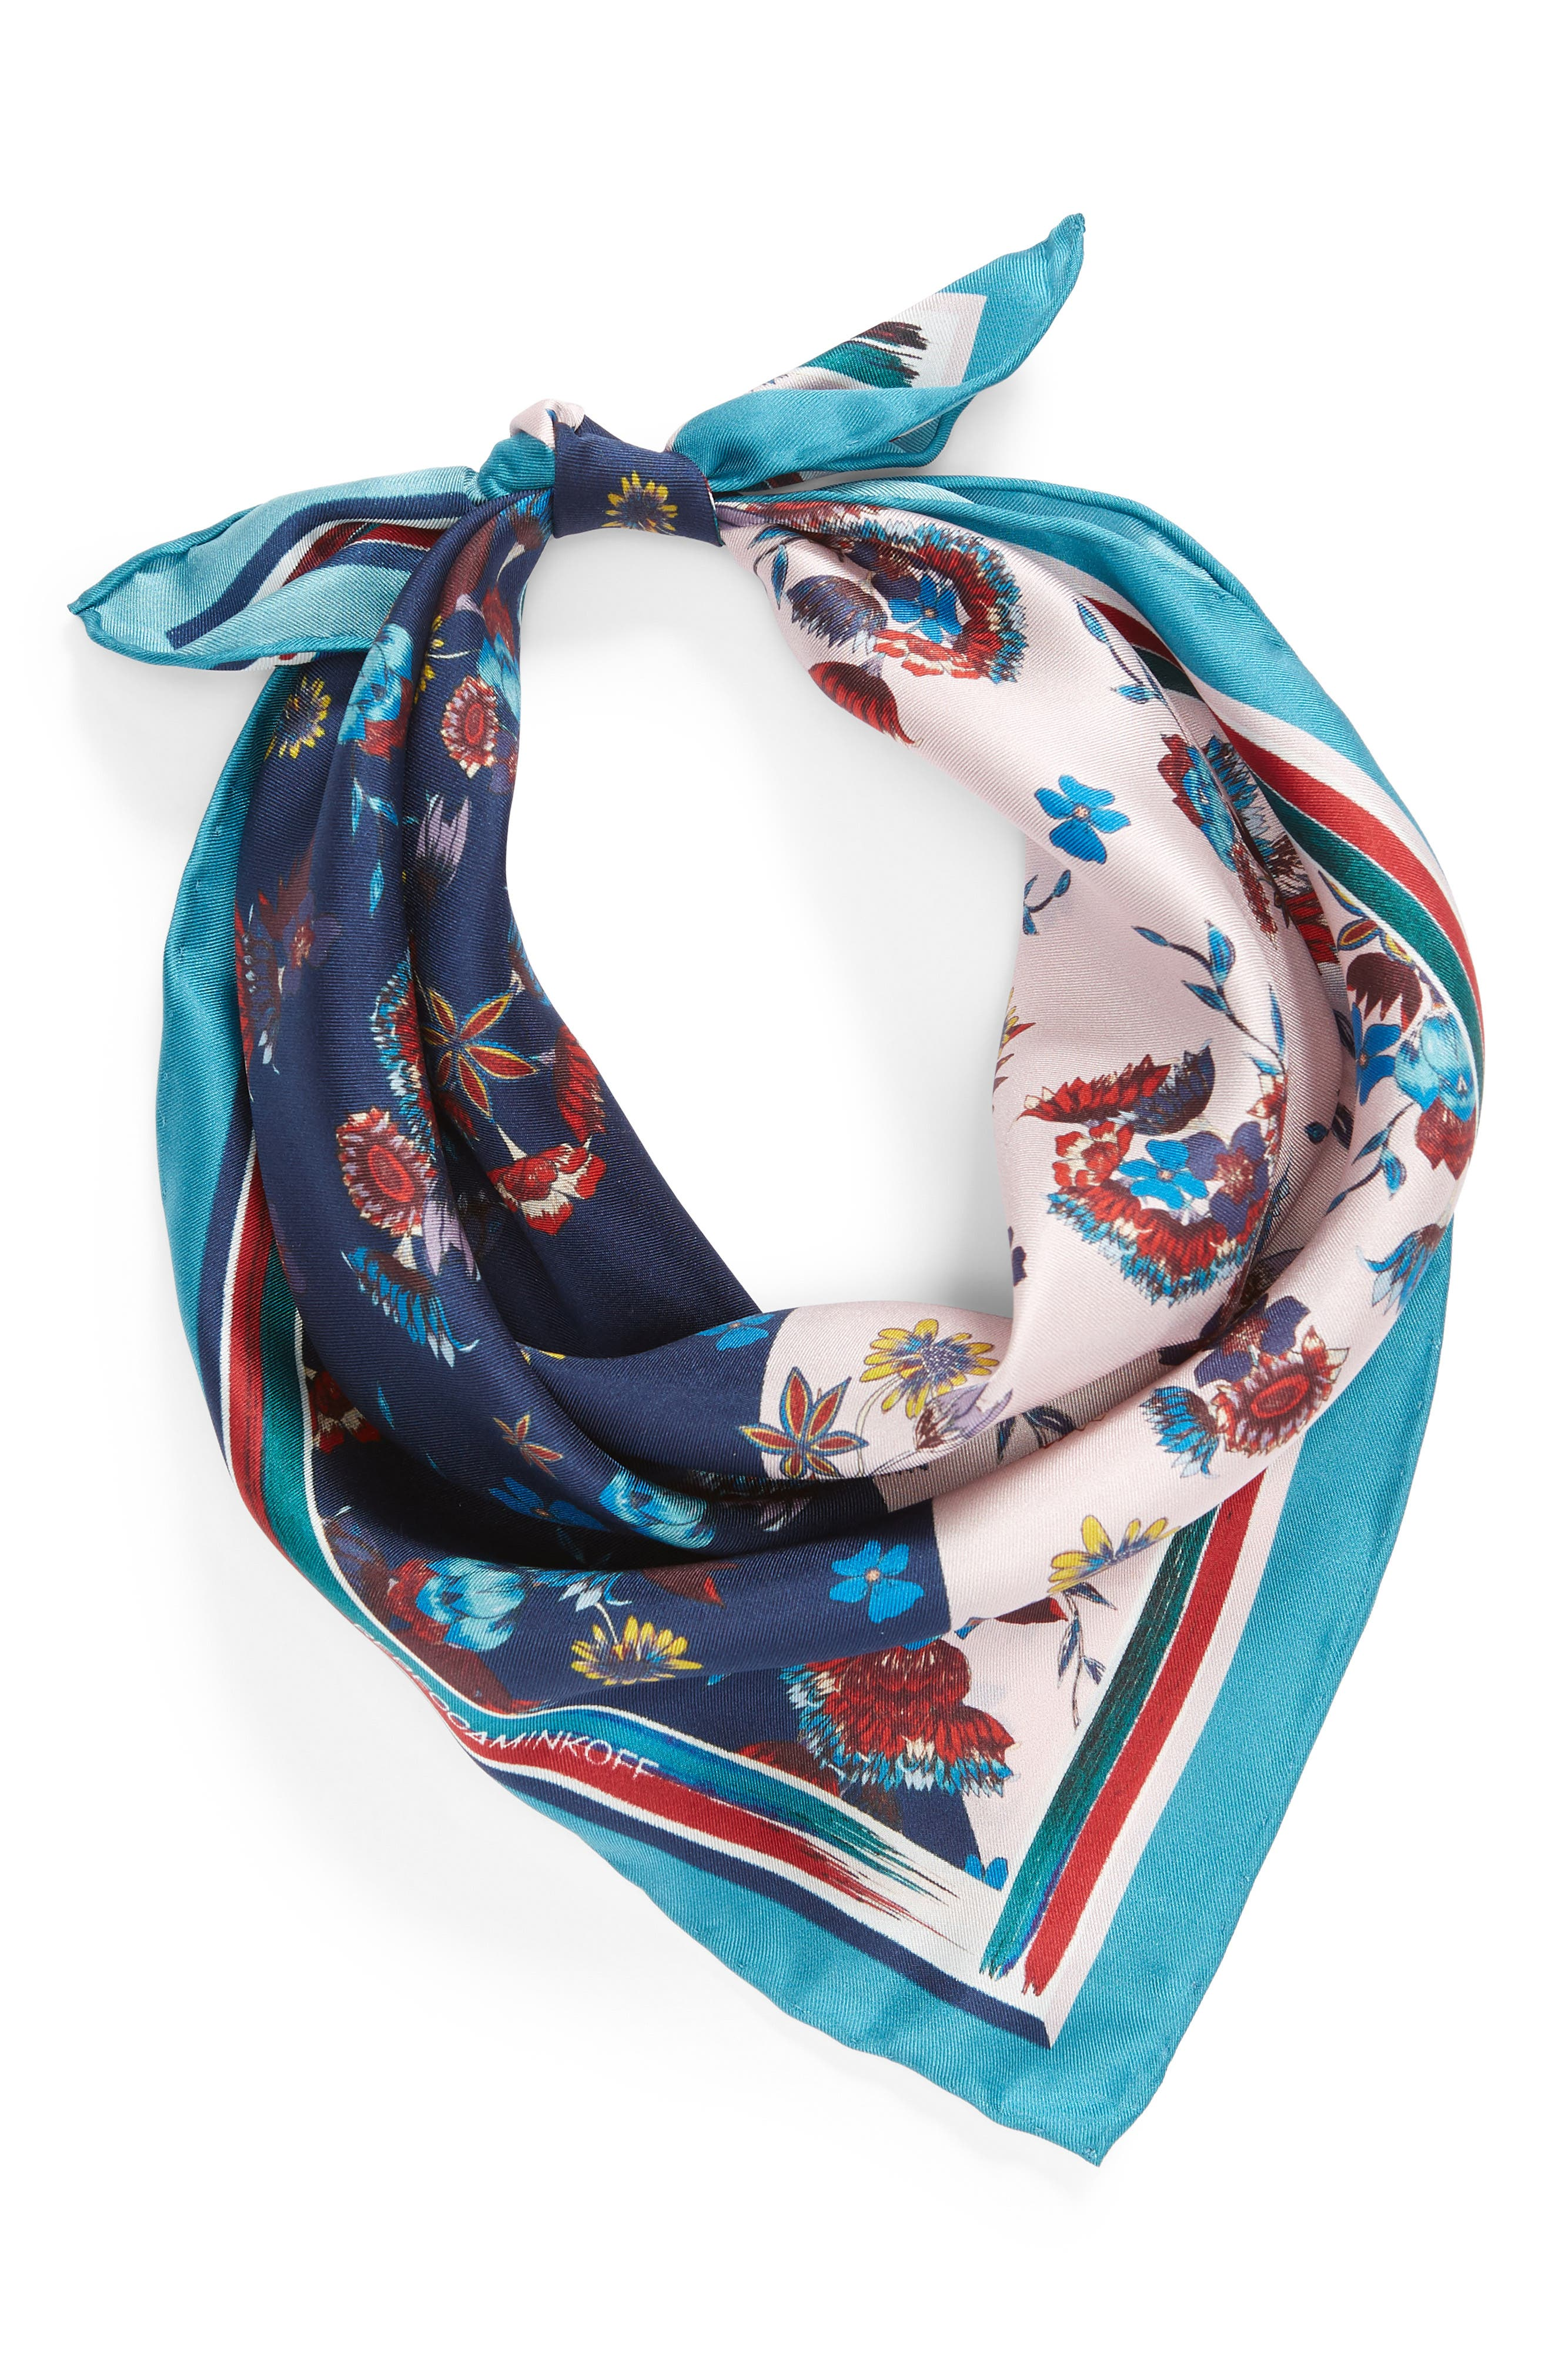 Pressed Floral Silk Bandana,                             Alternate thumbnail 2, color,                             PINK